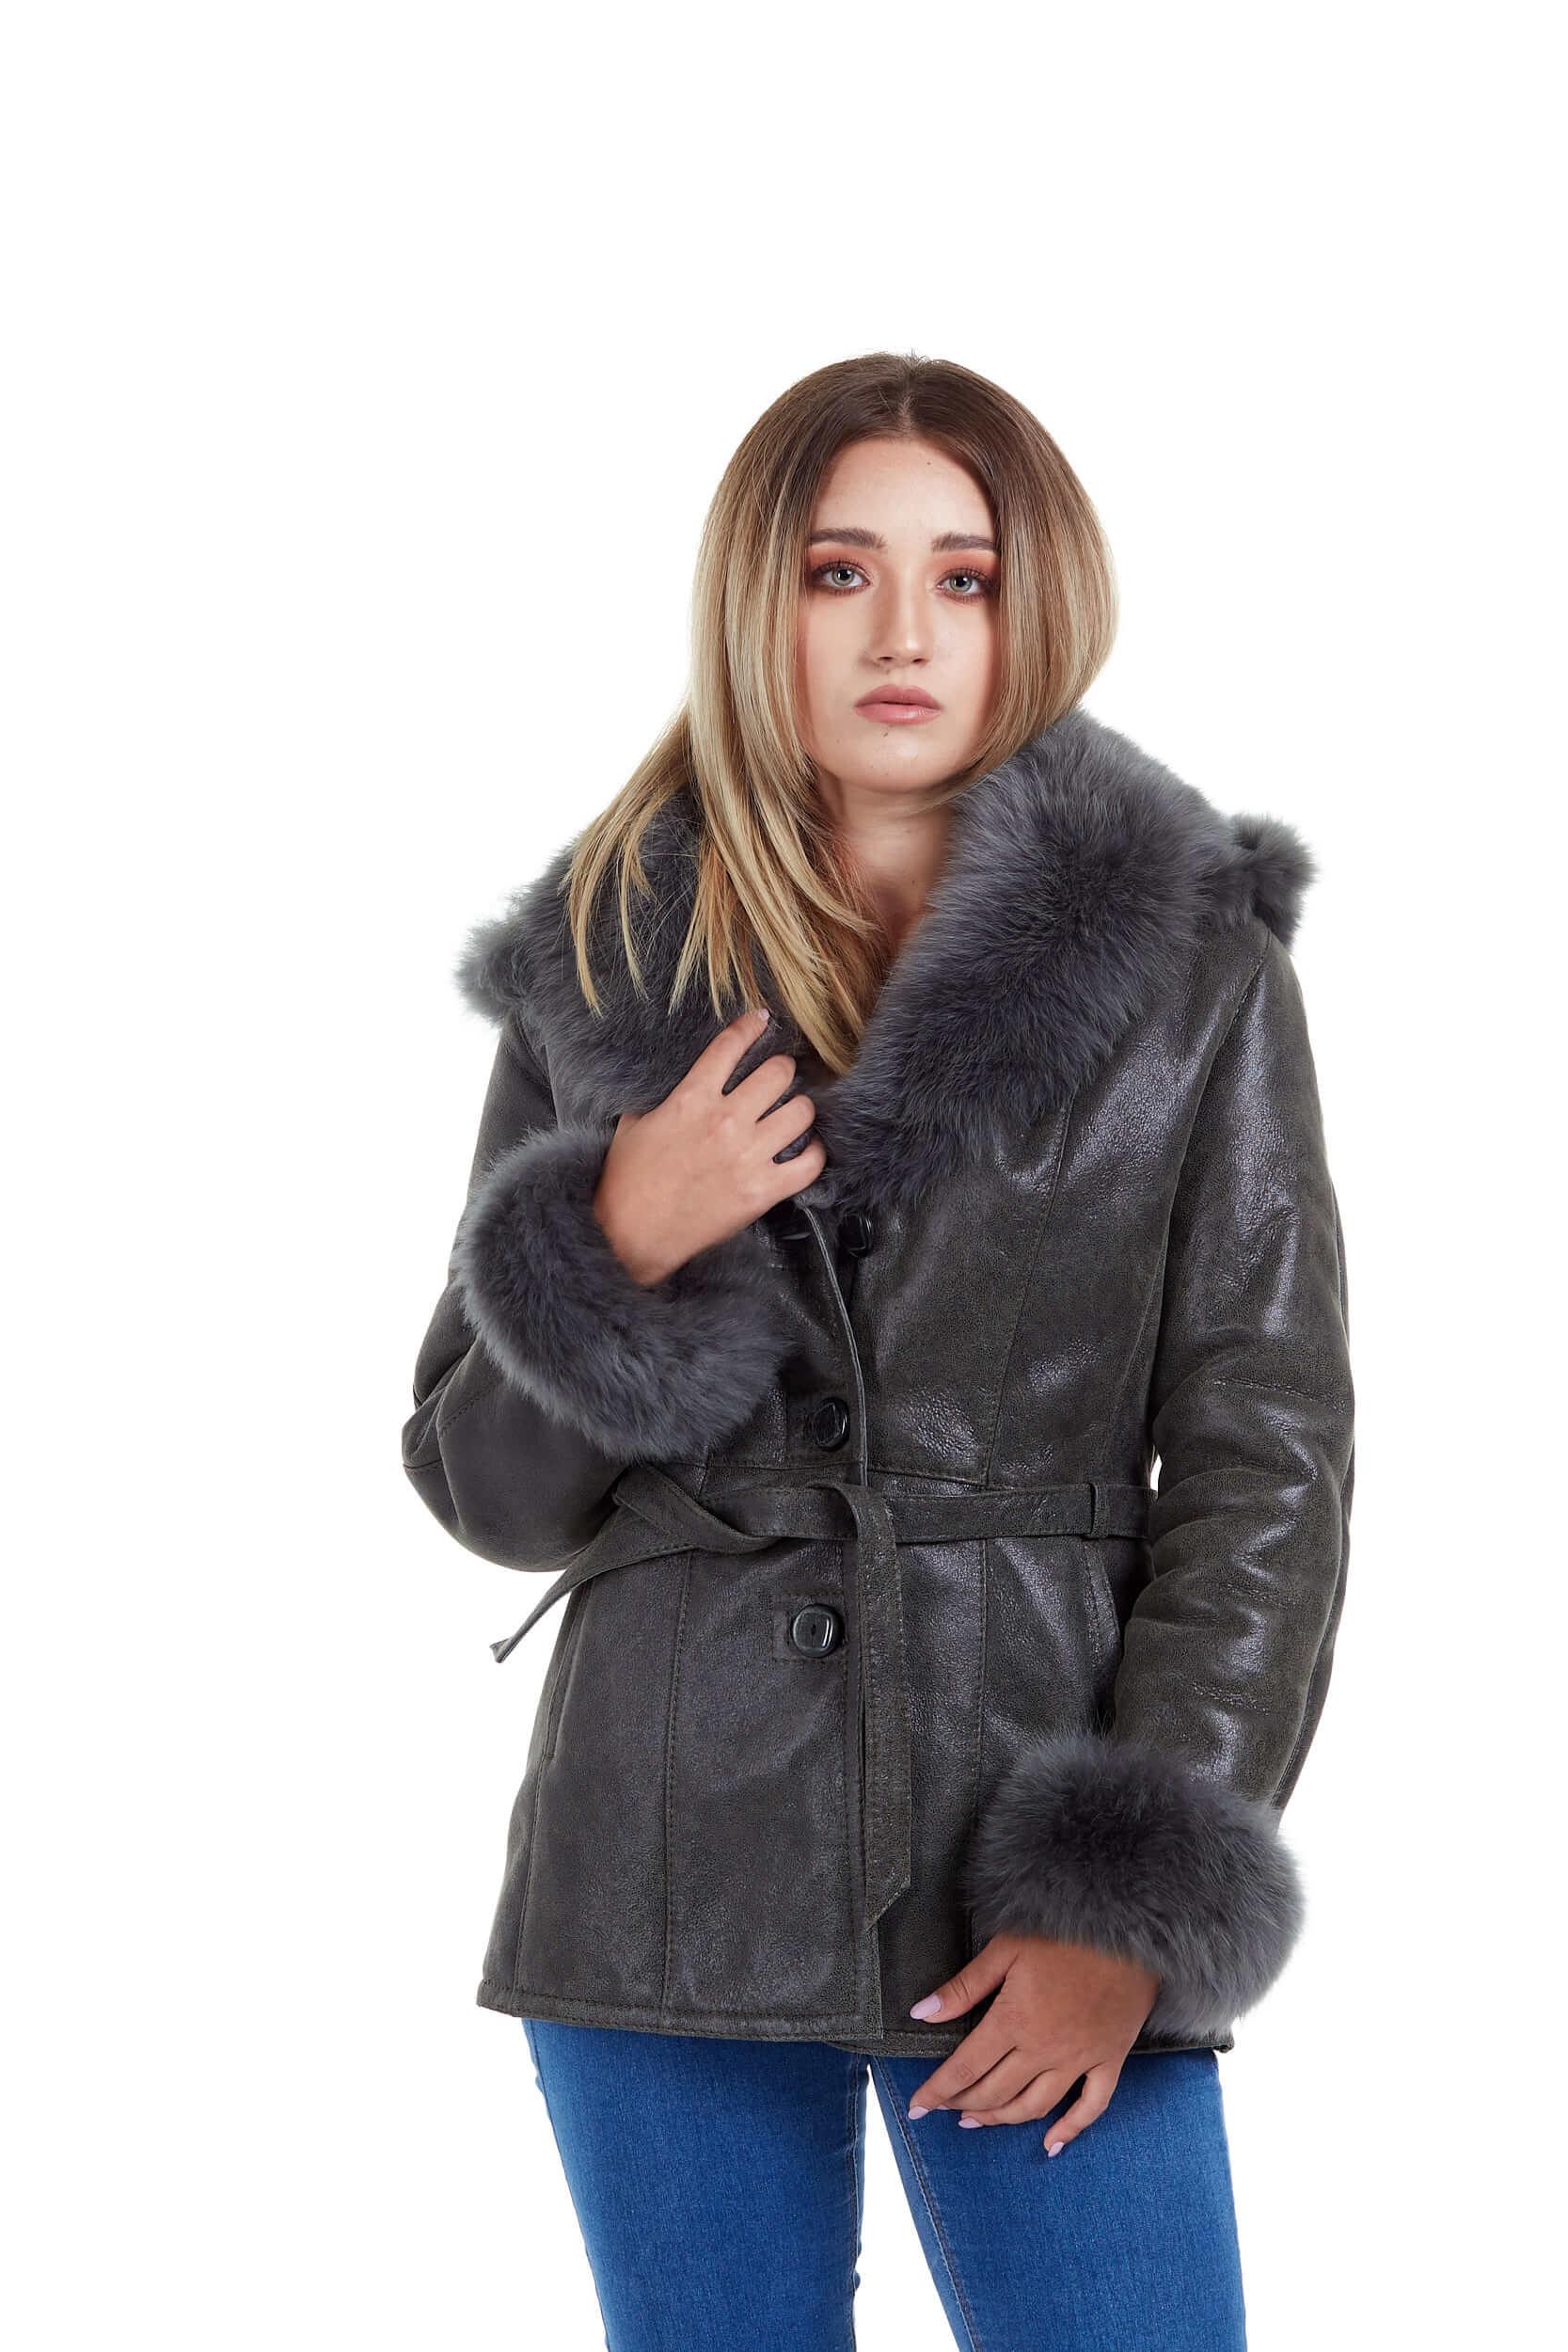 Haina de blana pentru femei model Shakira Oliv 2